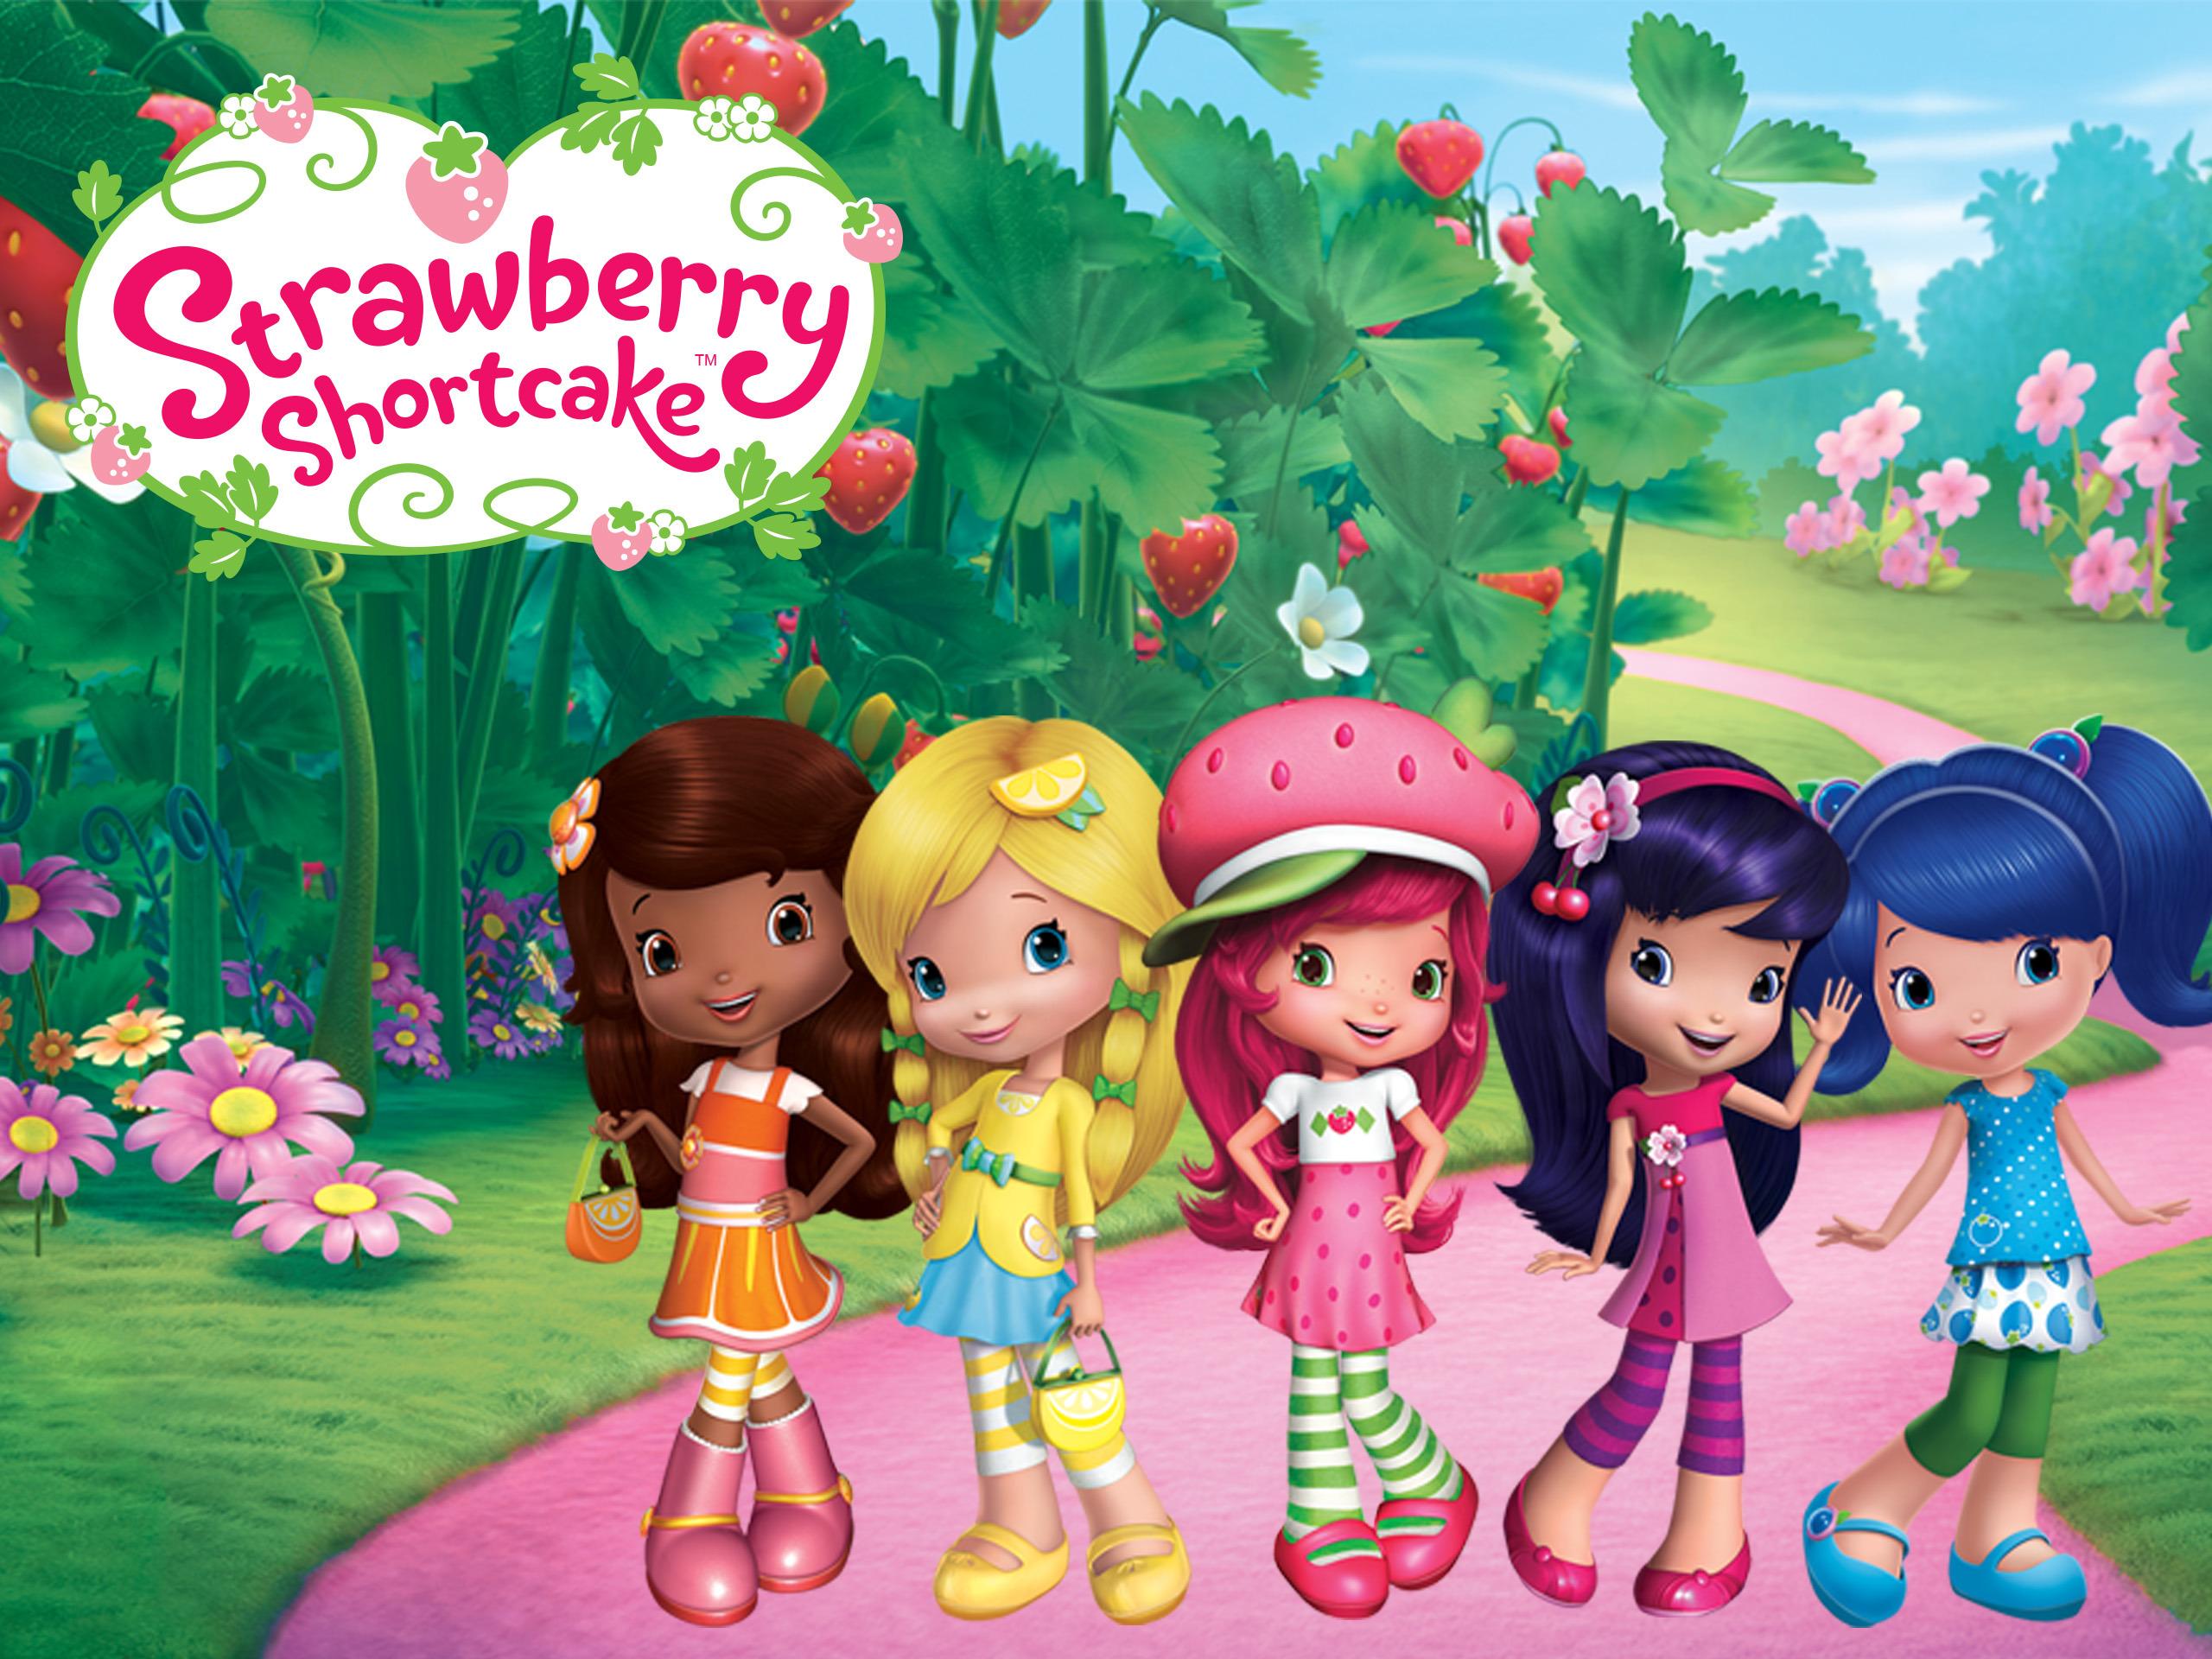 Strawberry Shortcake Berry Bitty Adventures Plum